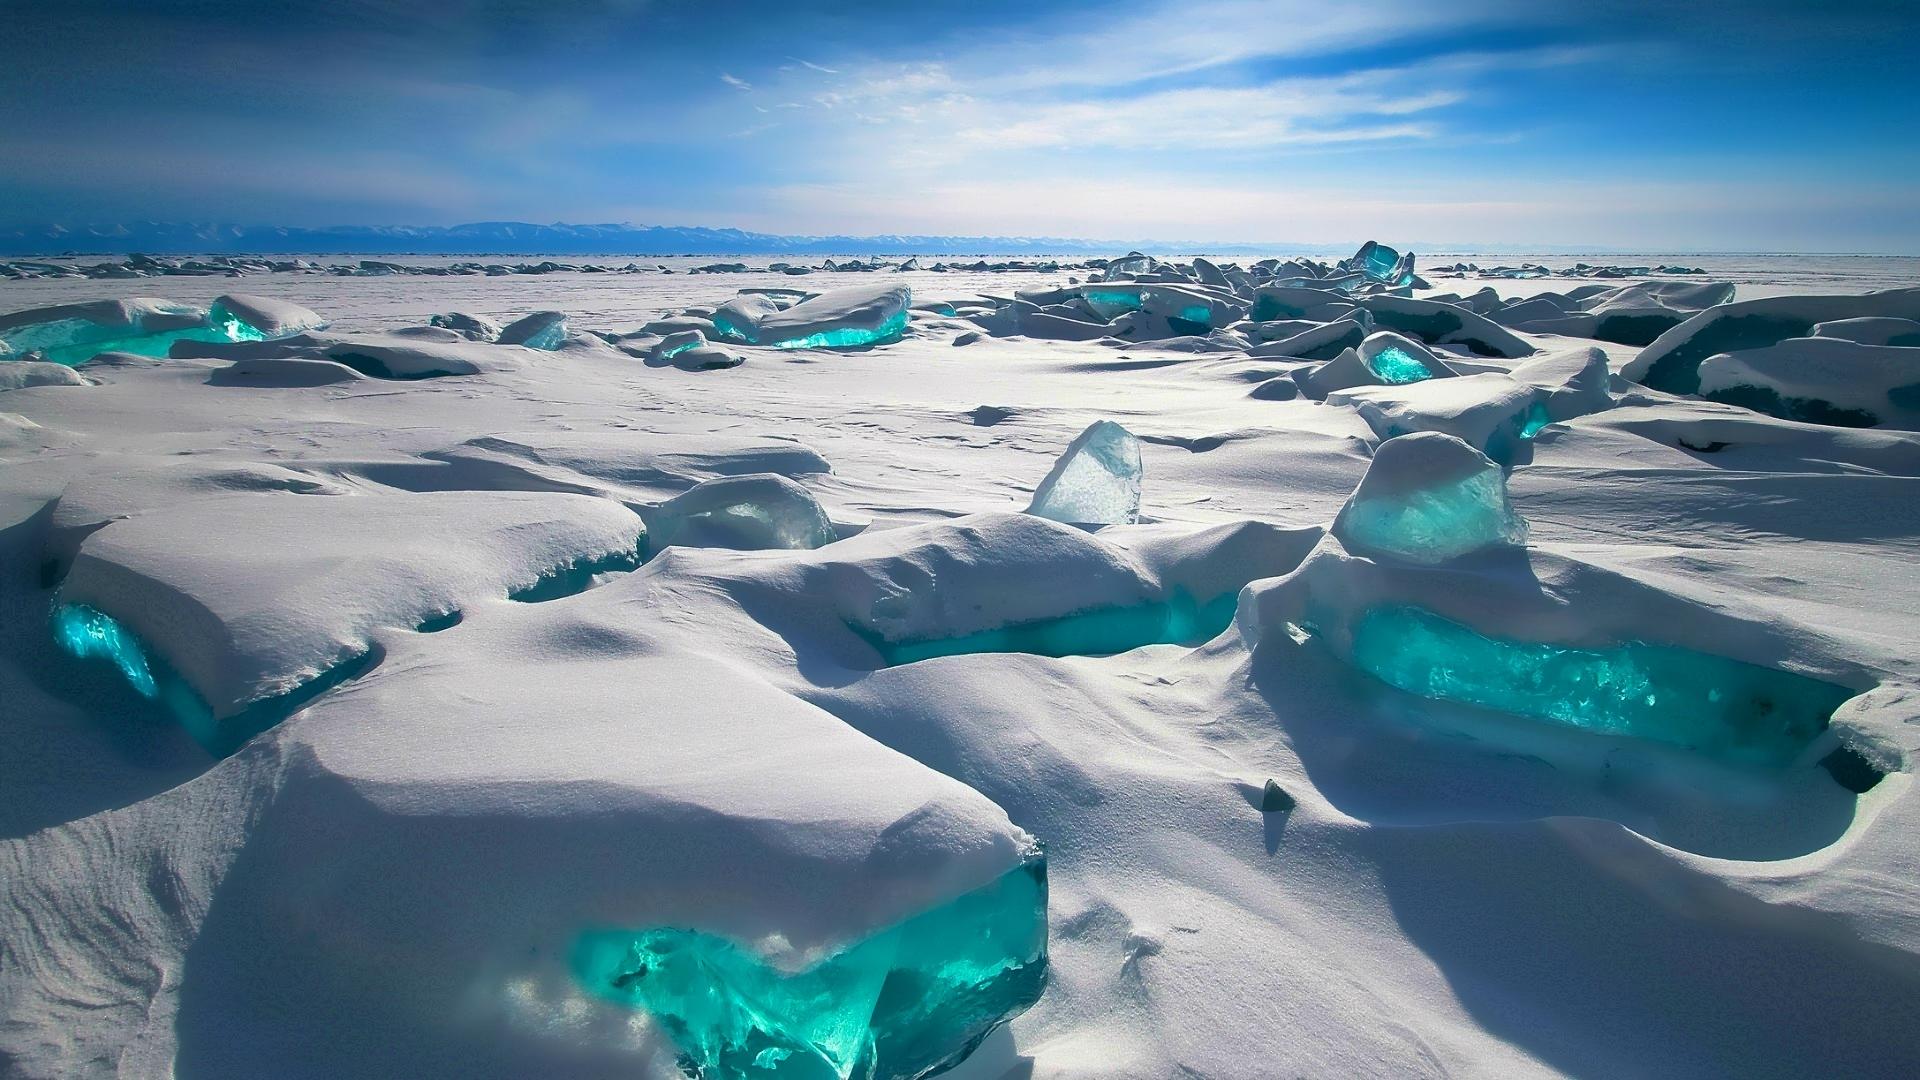 siberia-lake-baikal-cover-snow-tains-turquoise-ice-desktop